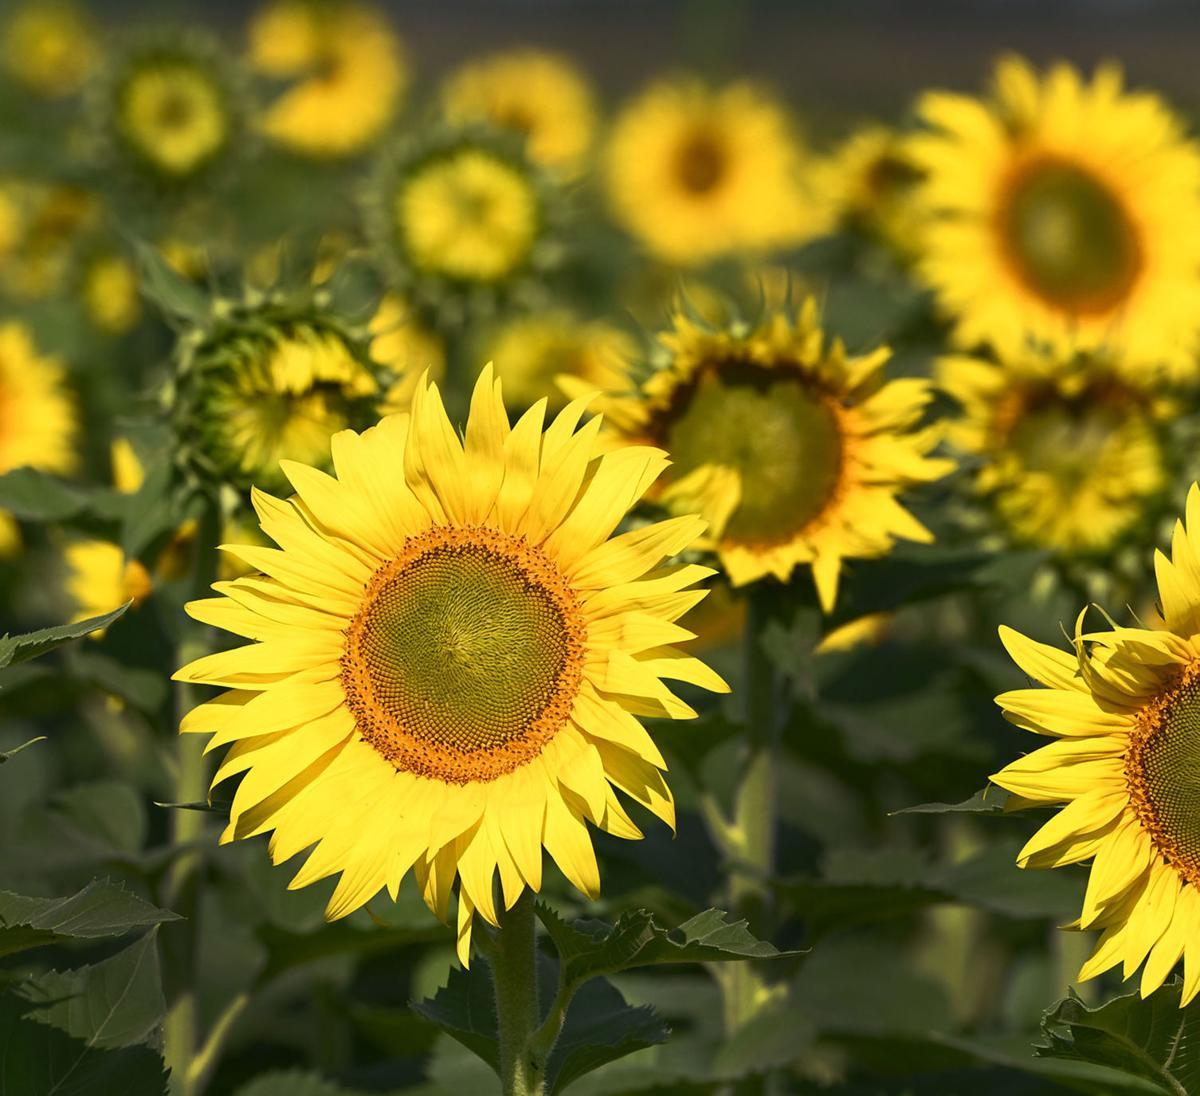 11 Ben August 2021 Sunflowers near Cecil